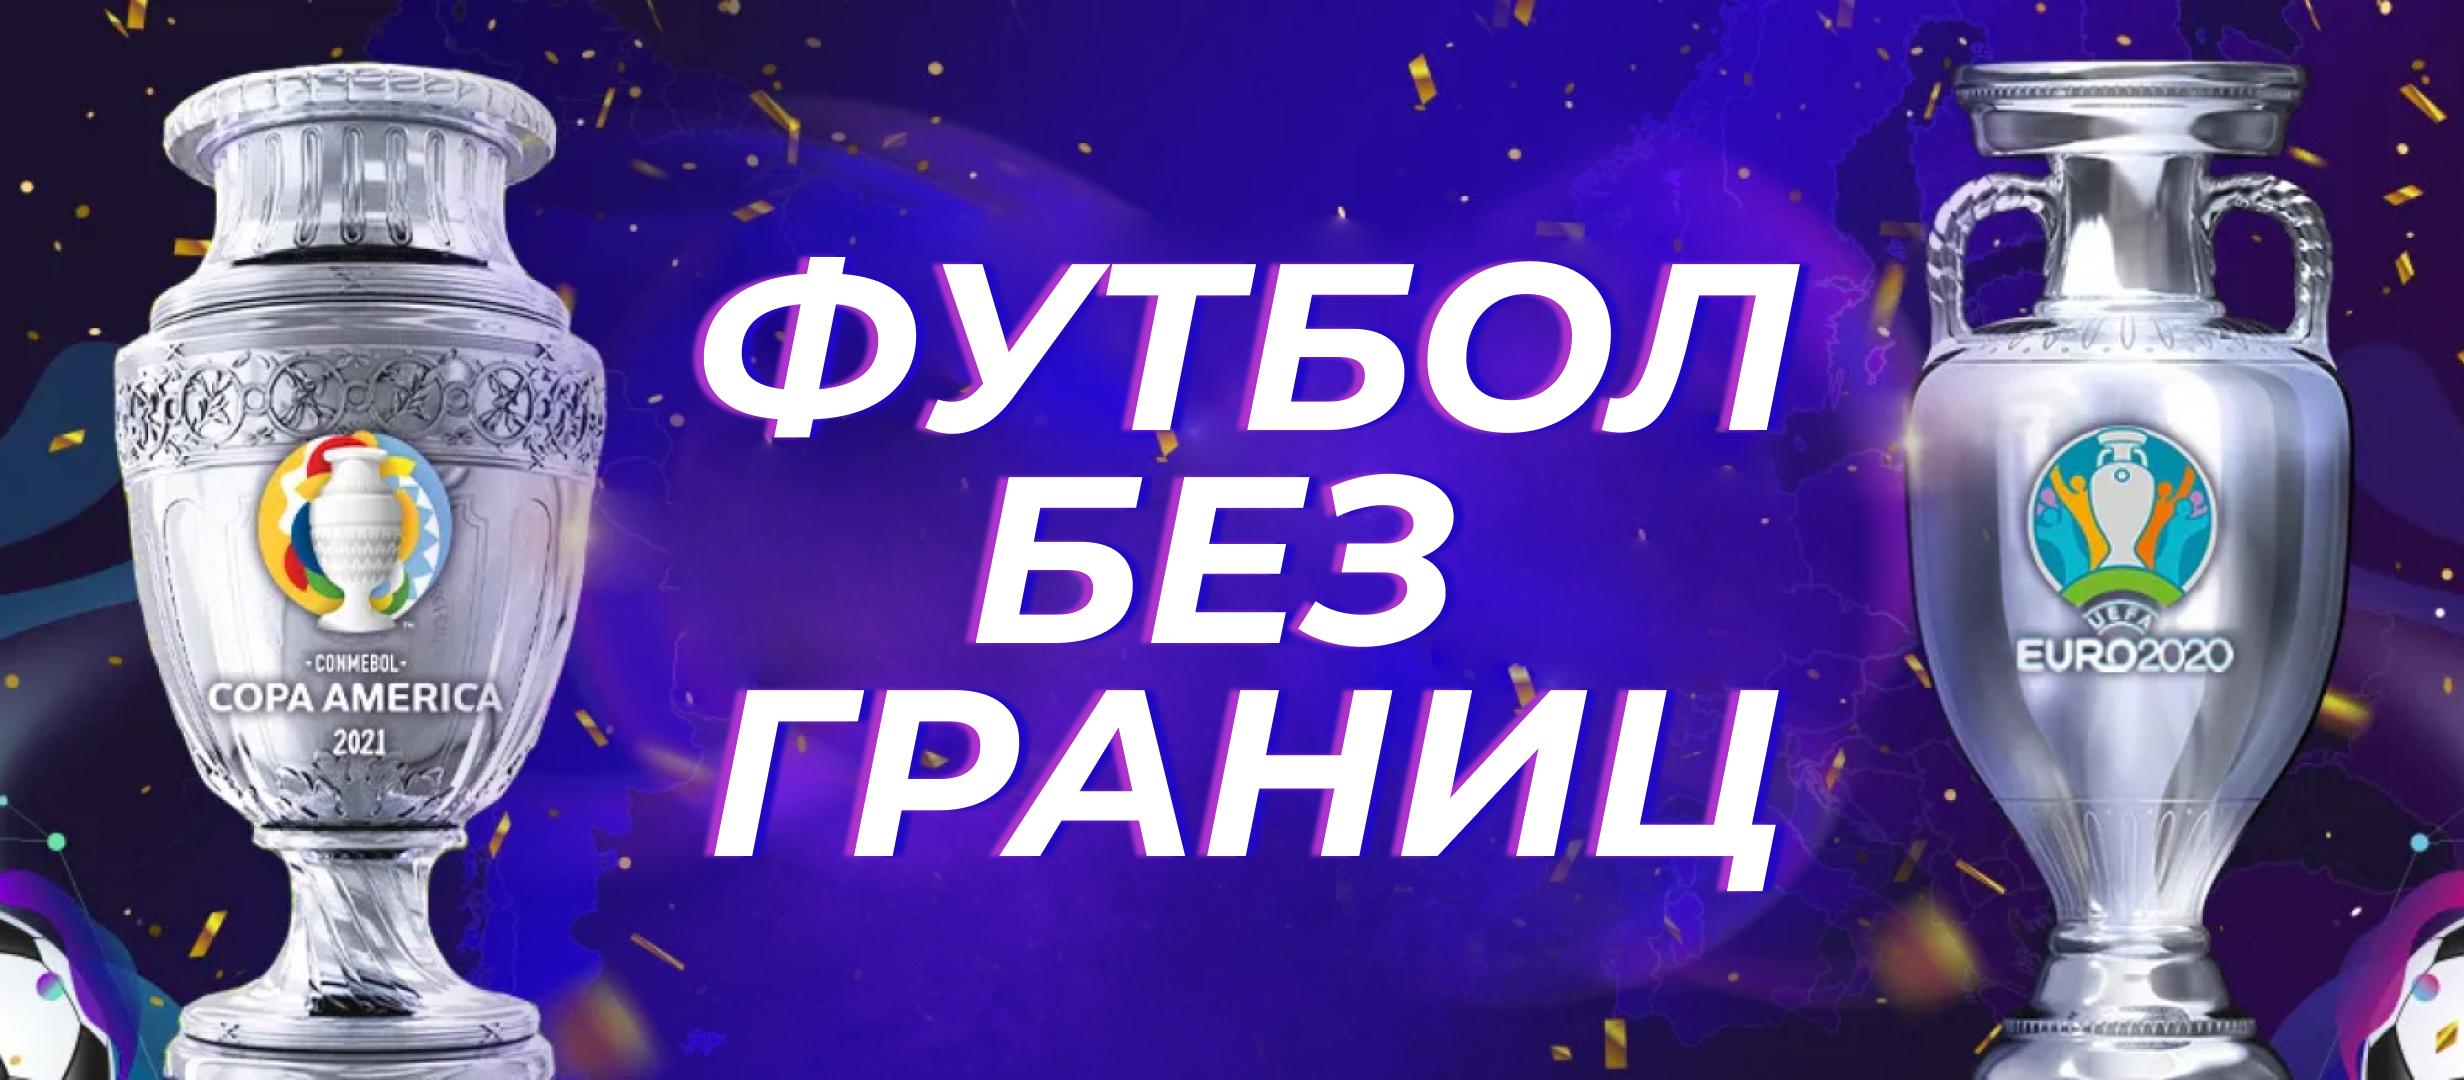 Кеш-бонус от Grandsport 6250 руб..